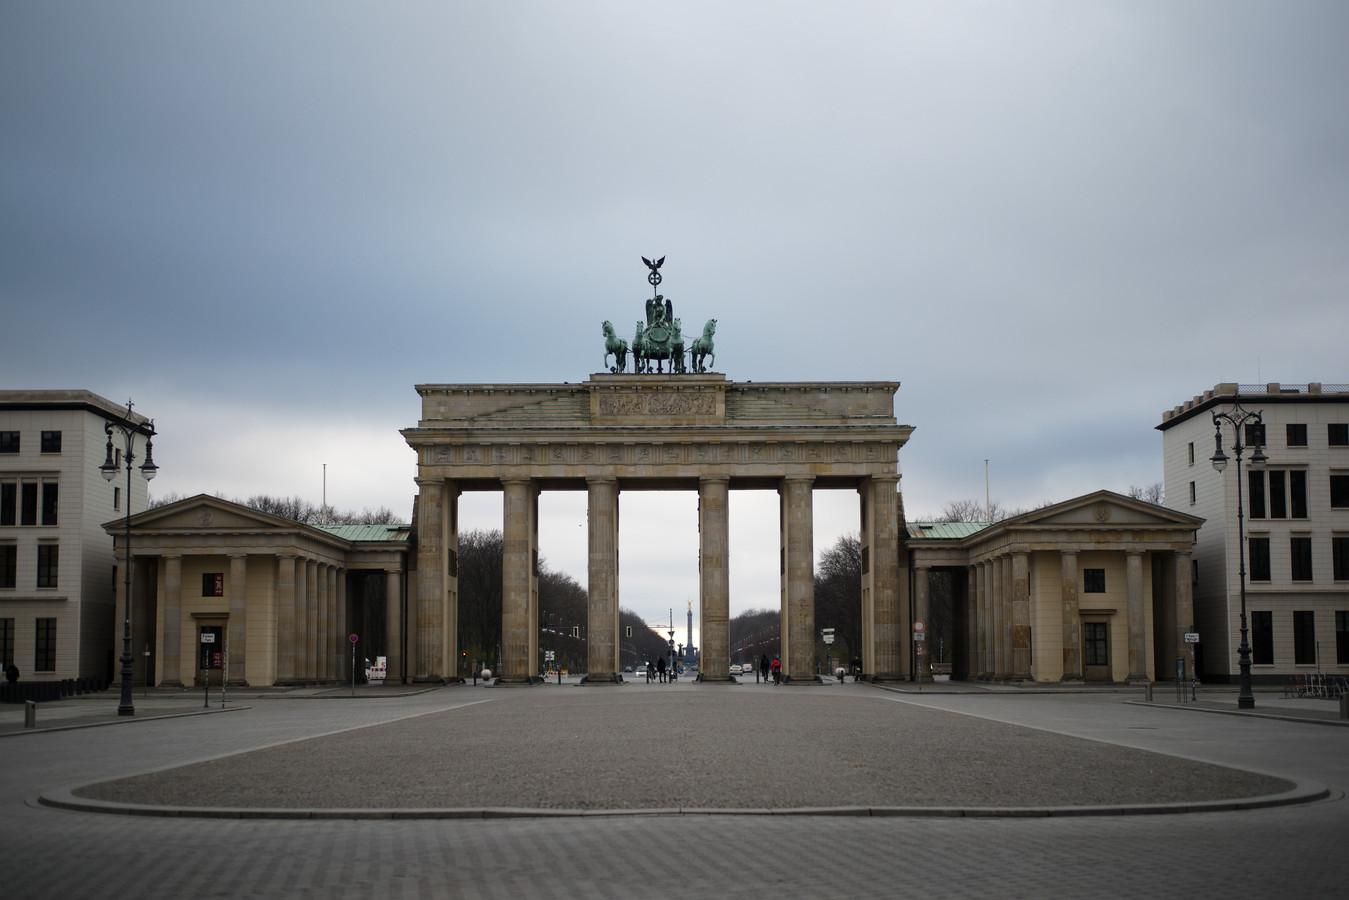 La porte de Brandebourg, à Berlin, ce 27 novembre.